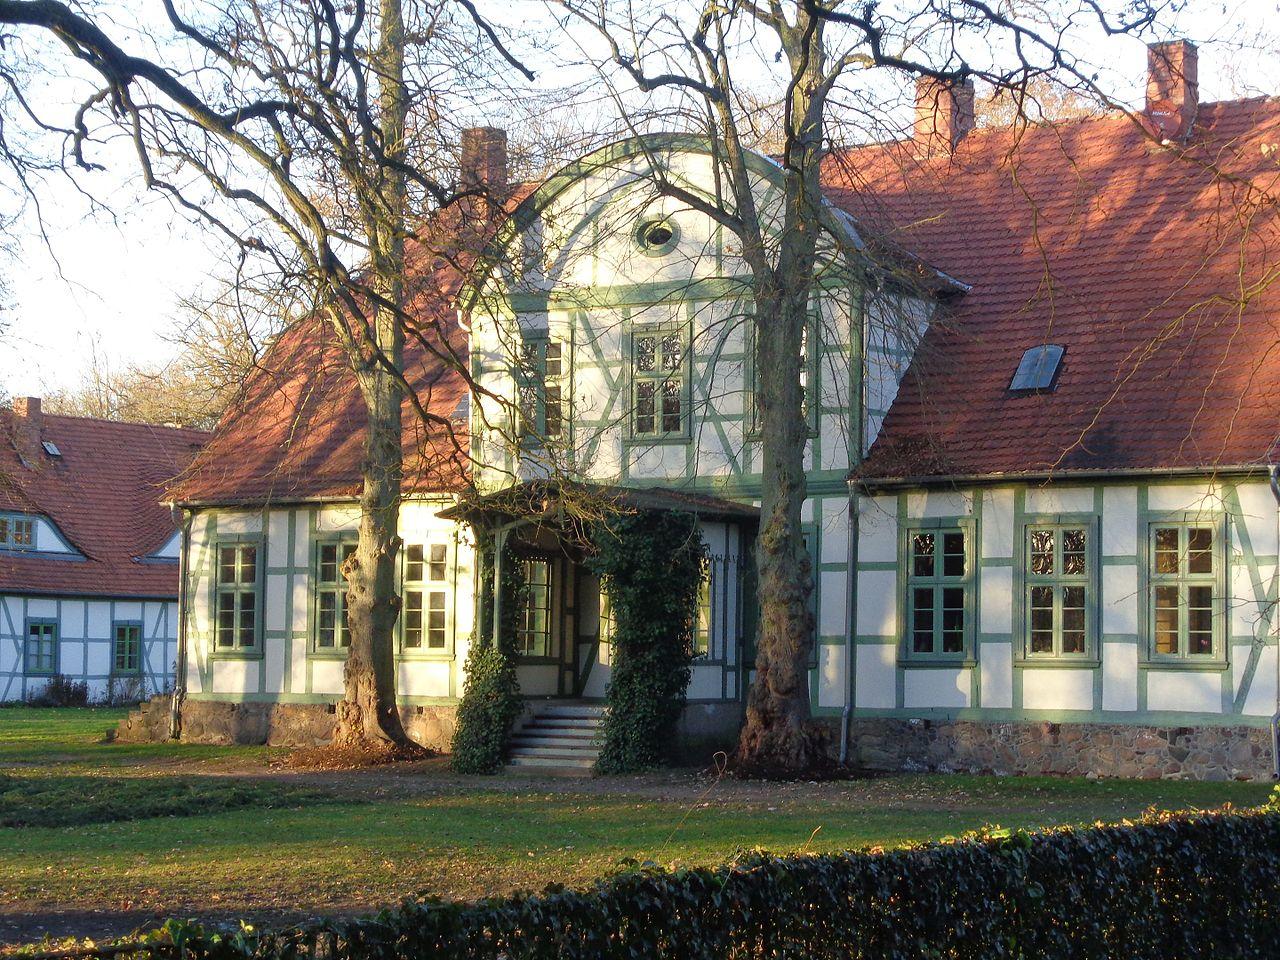 Bild Jagdschloss Friedrichsmoor